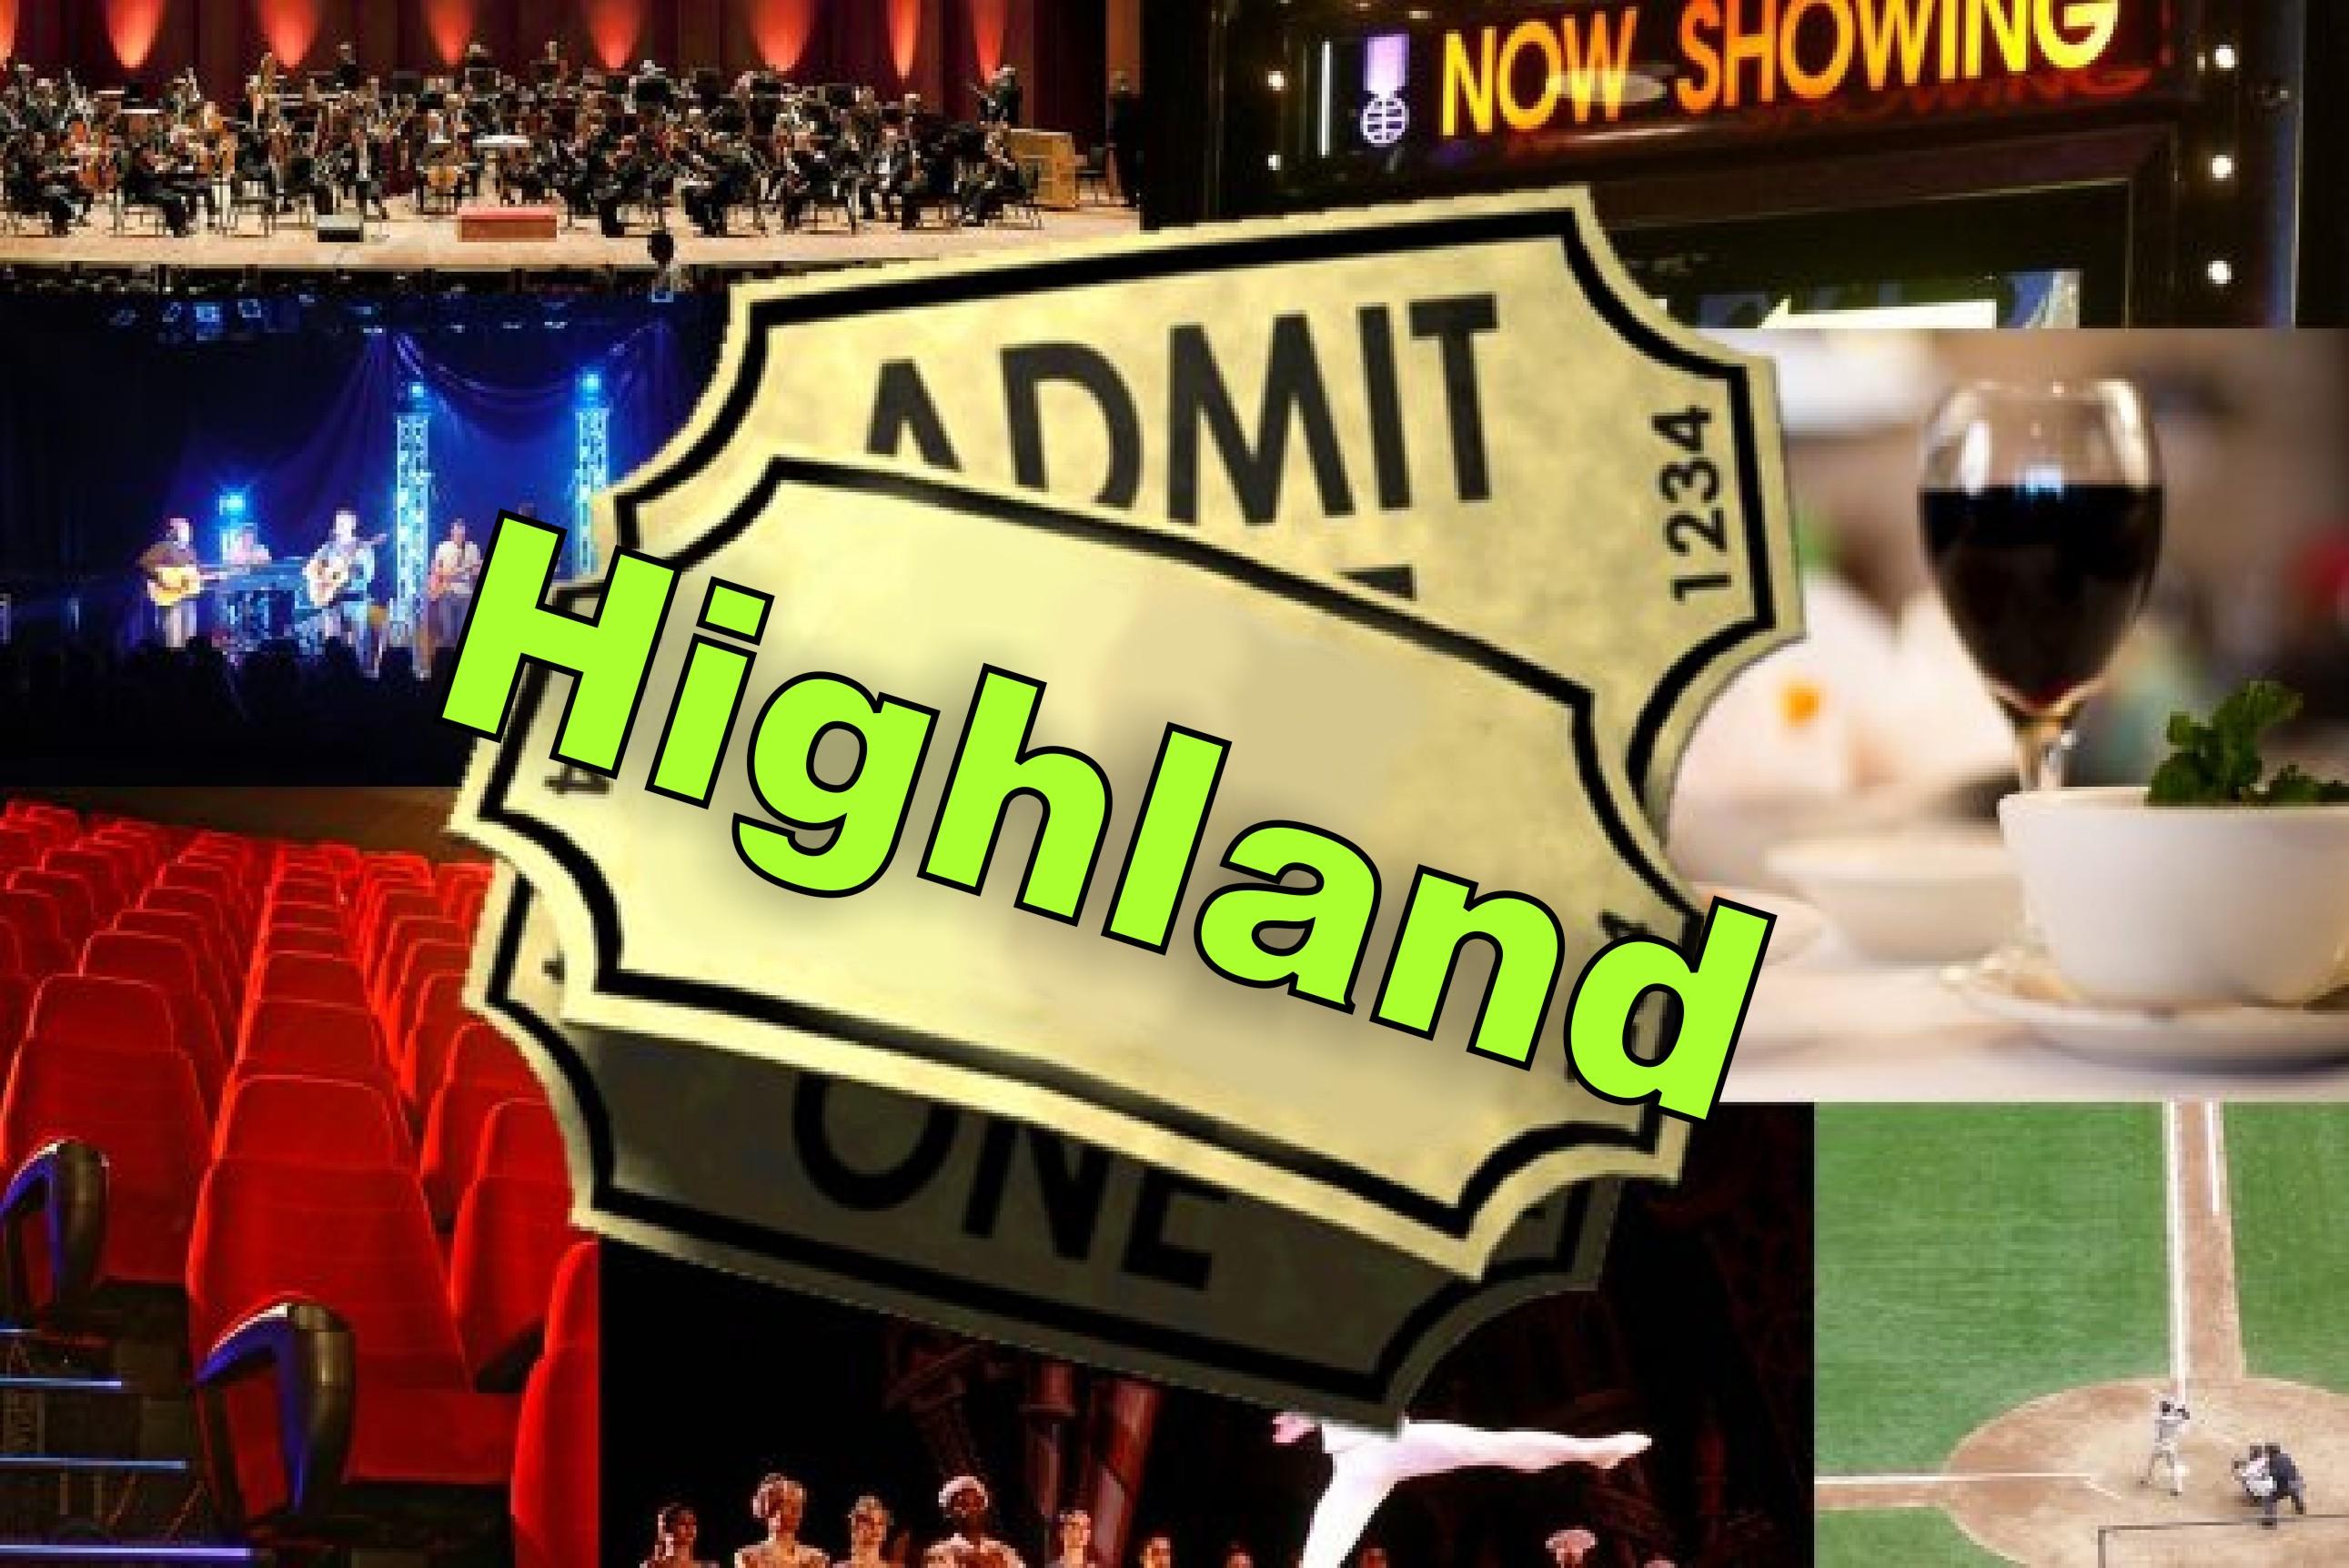 things to do festivals events calendar Highland indiana